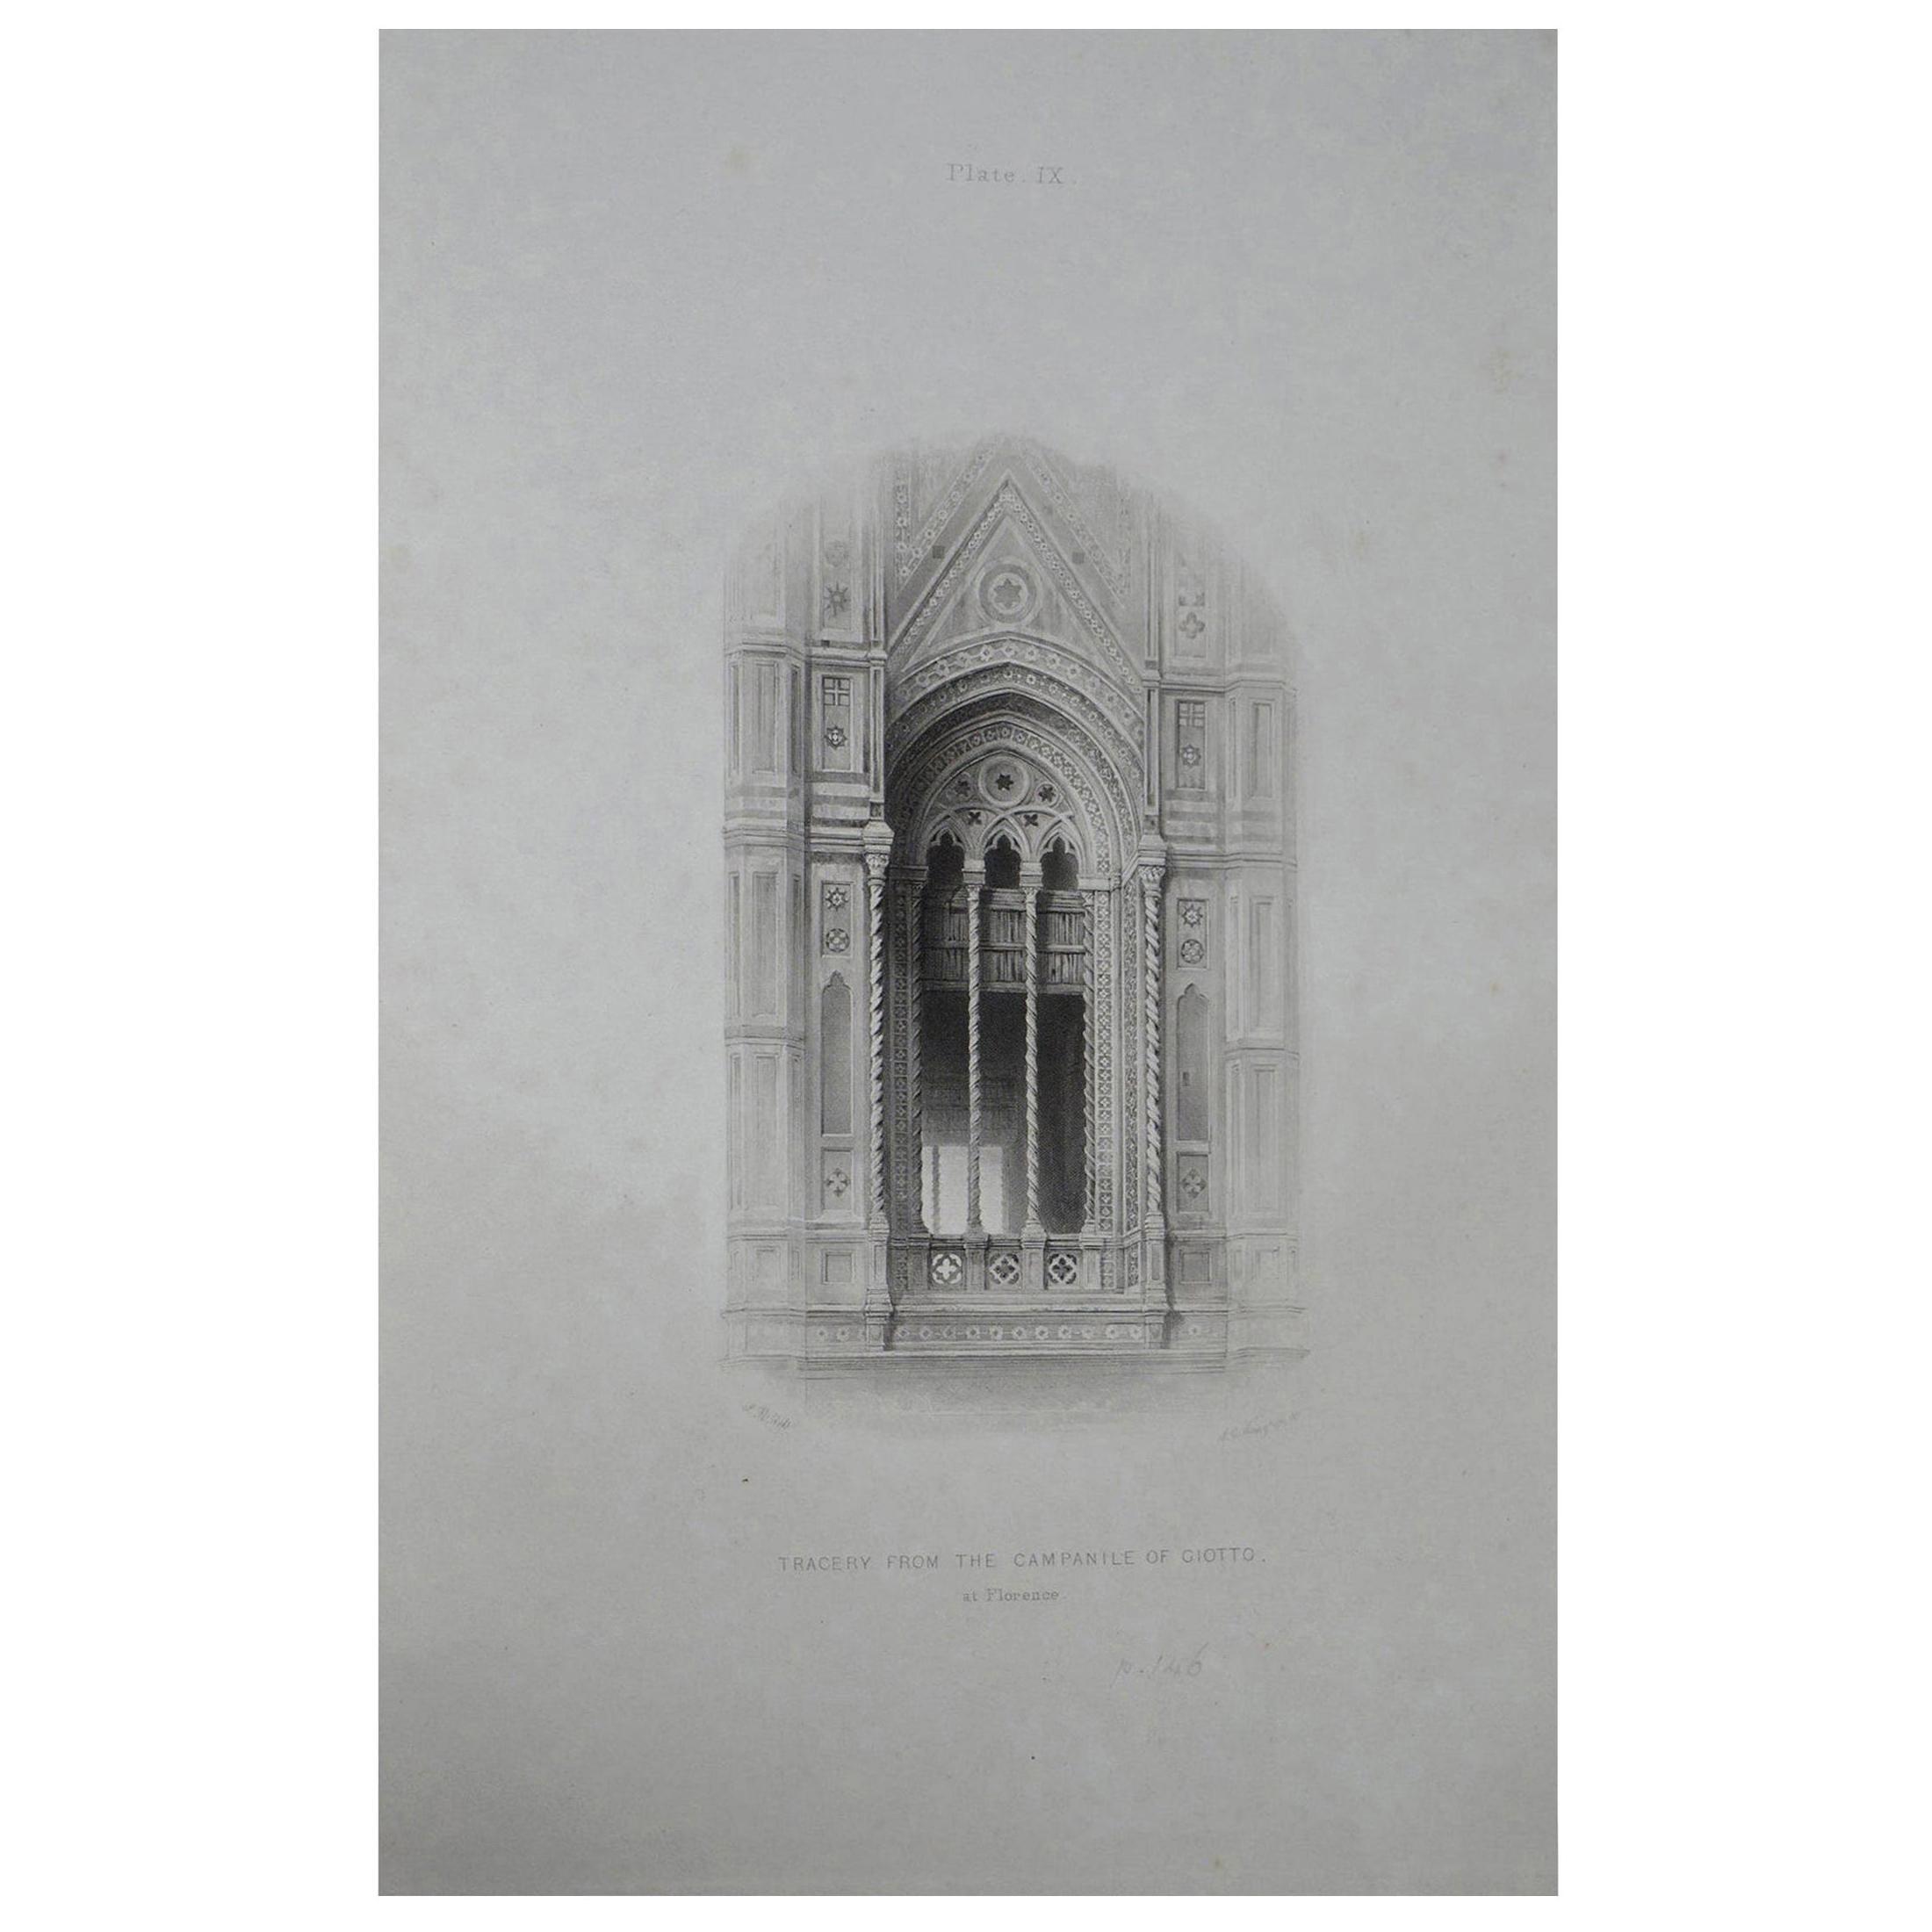 Original Antique Architectural Print by John Ruskin, circa 1880, 'Florence'